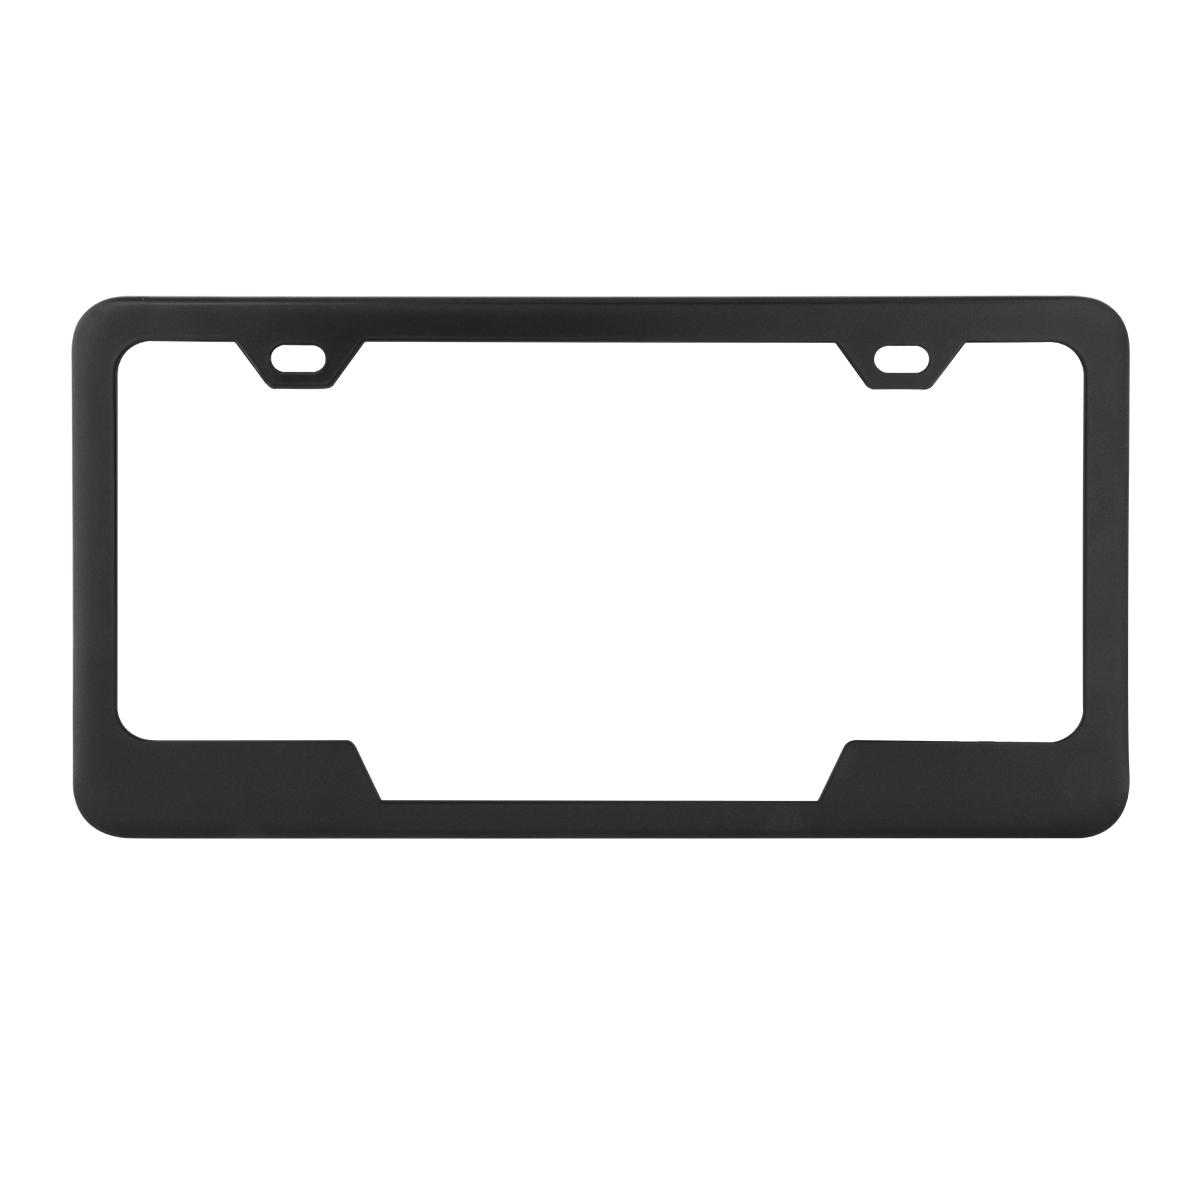 60406 Plain 2-Hole License Plate Frames with Center Cut